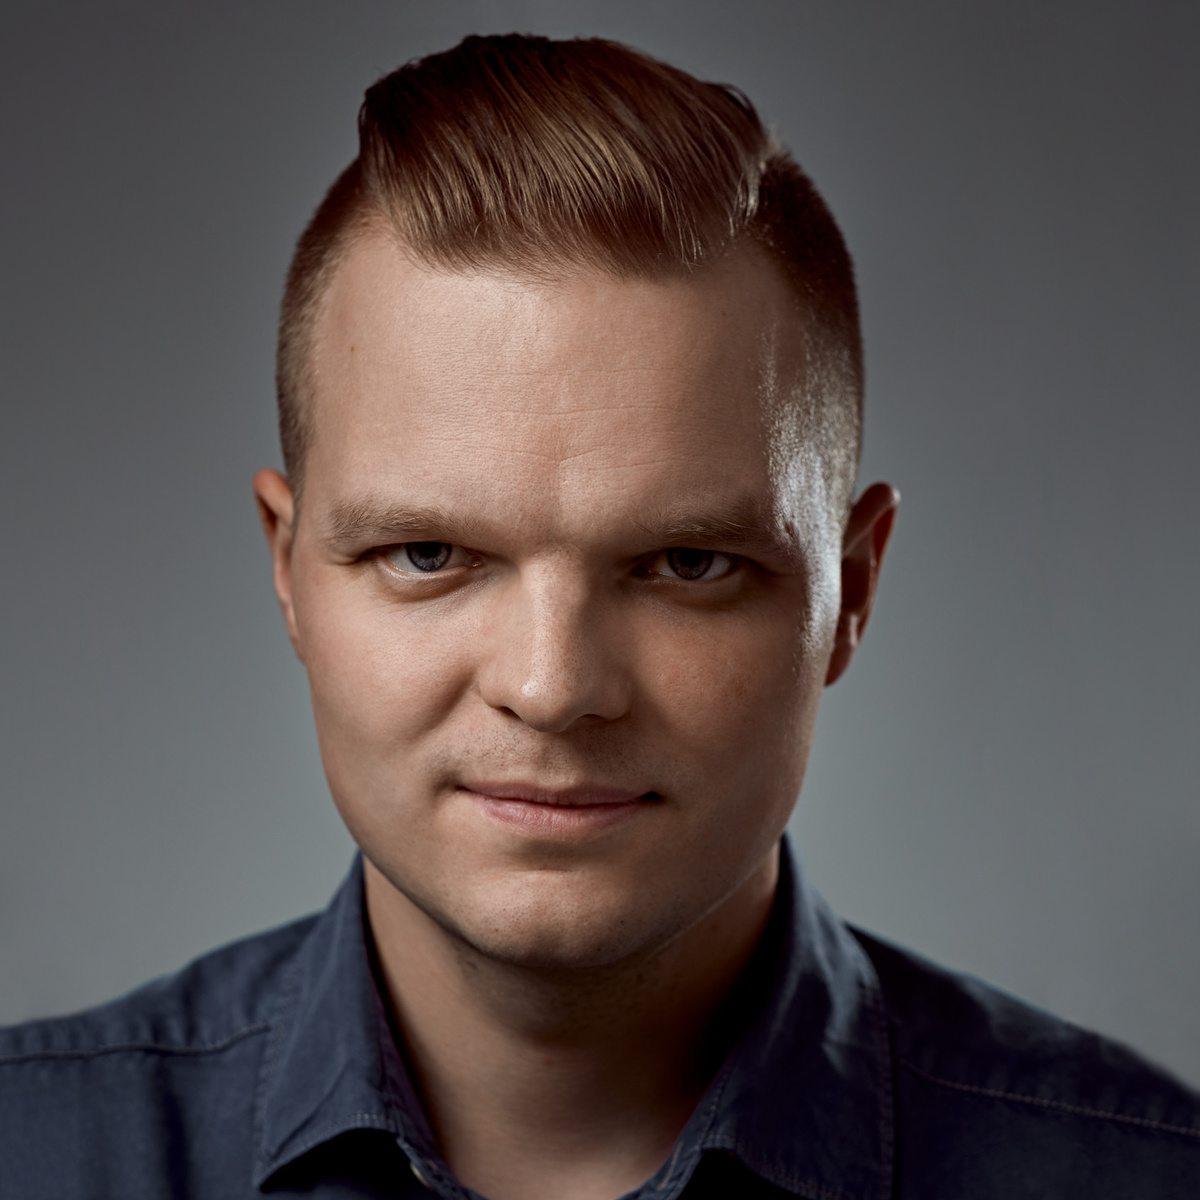 Mateusz Tarczynski